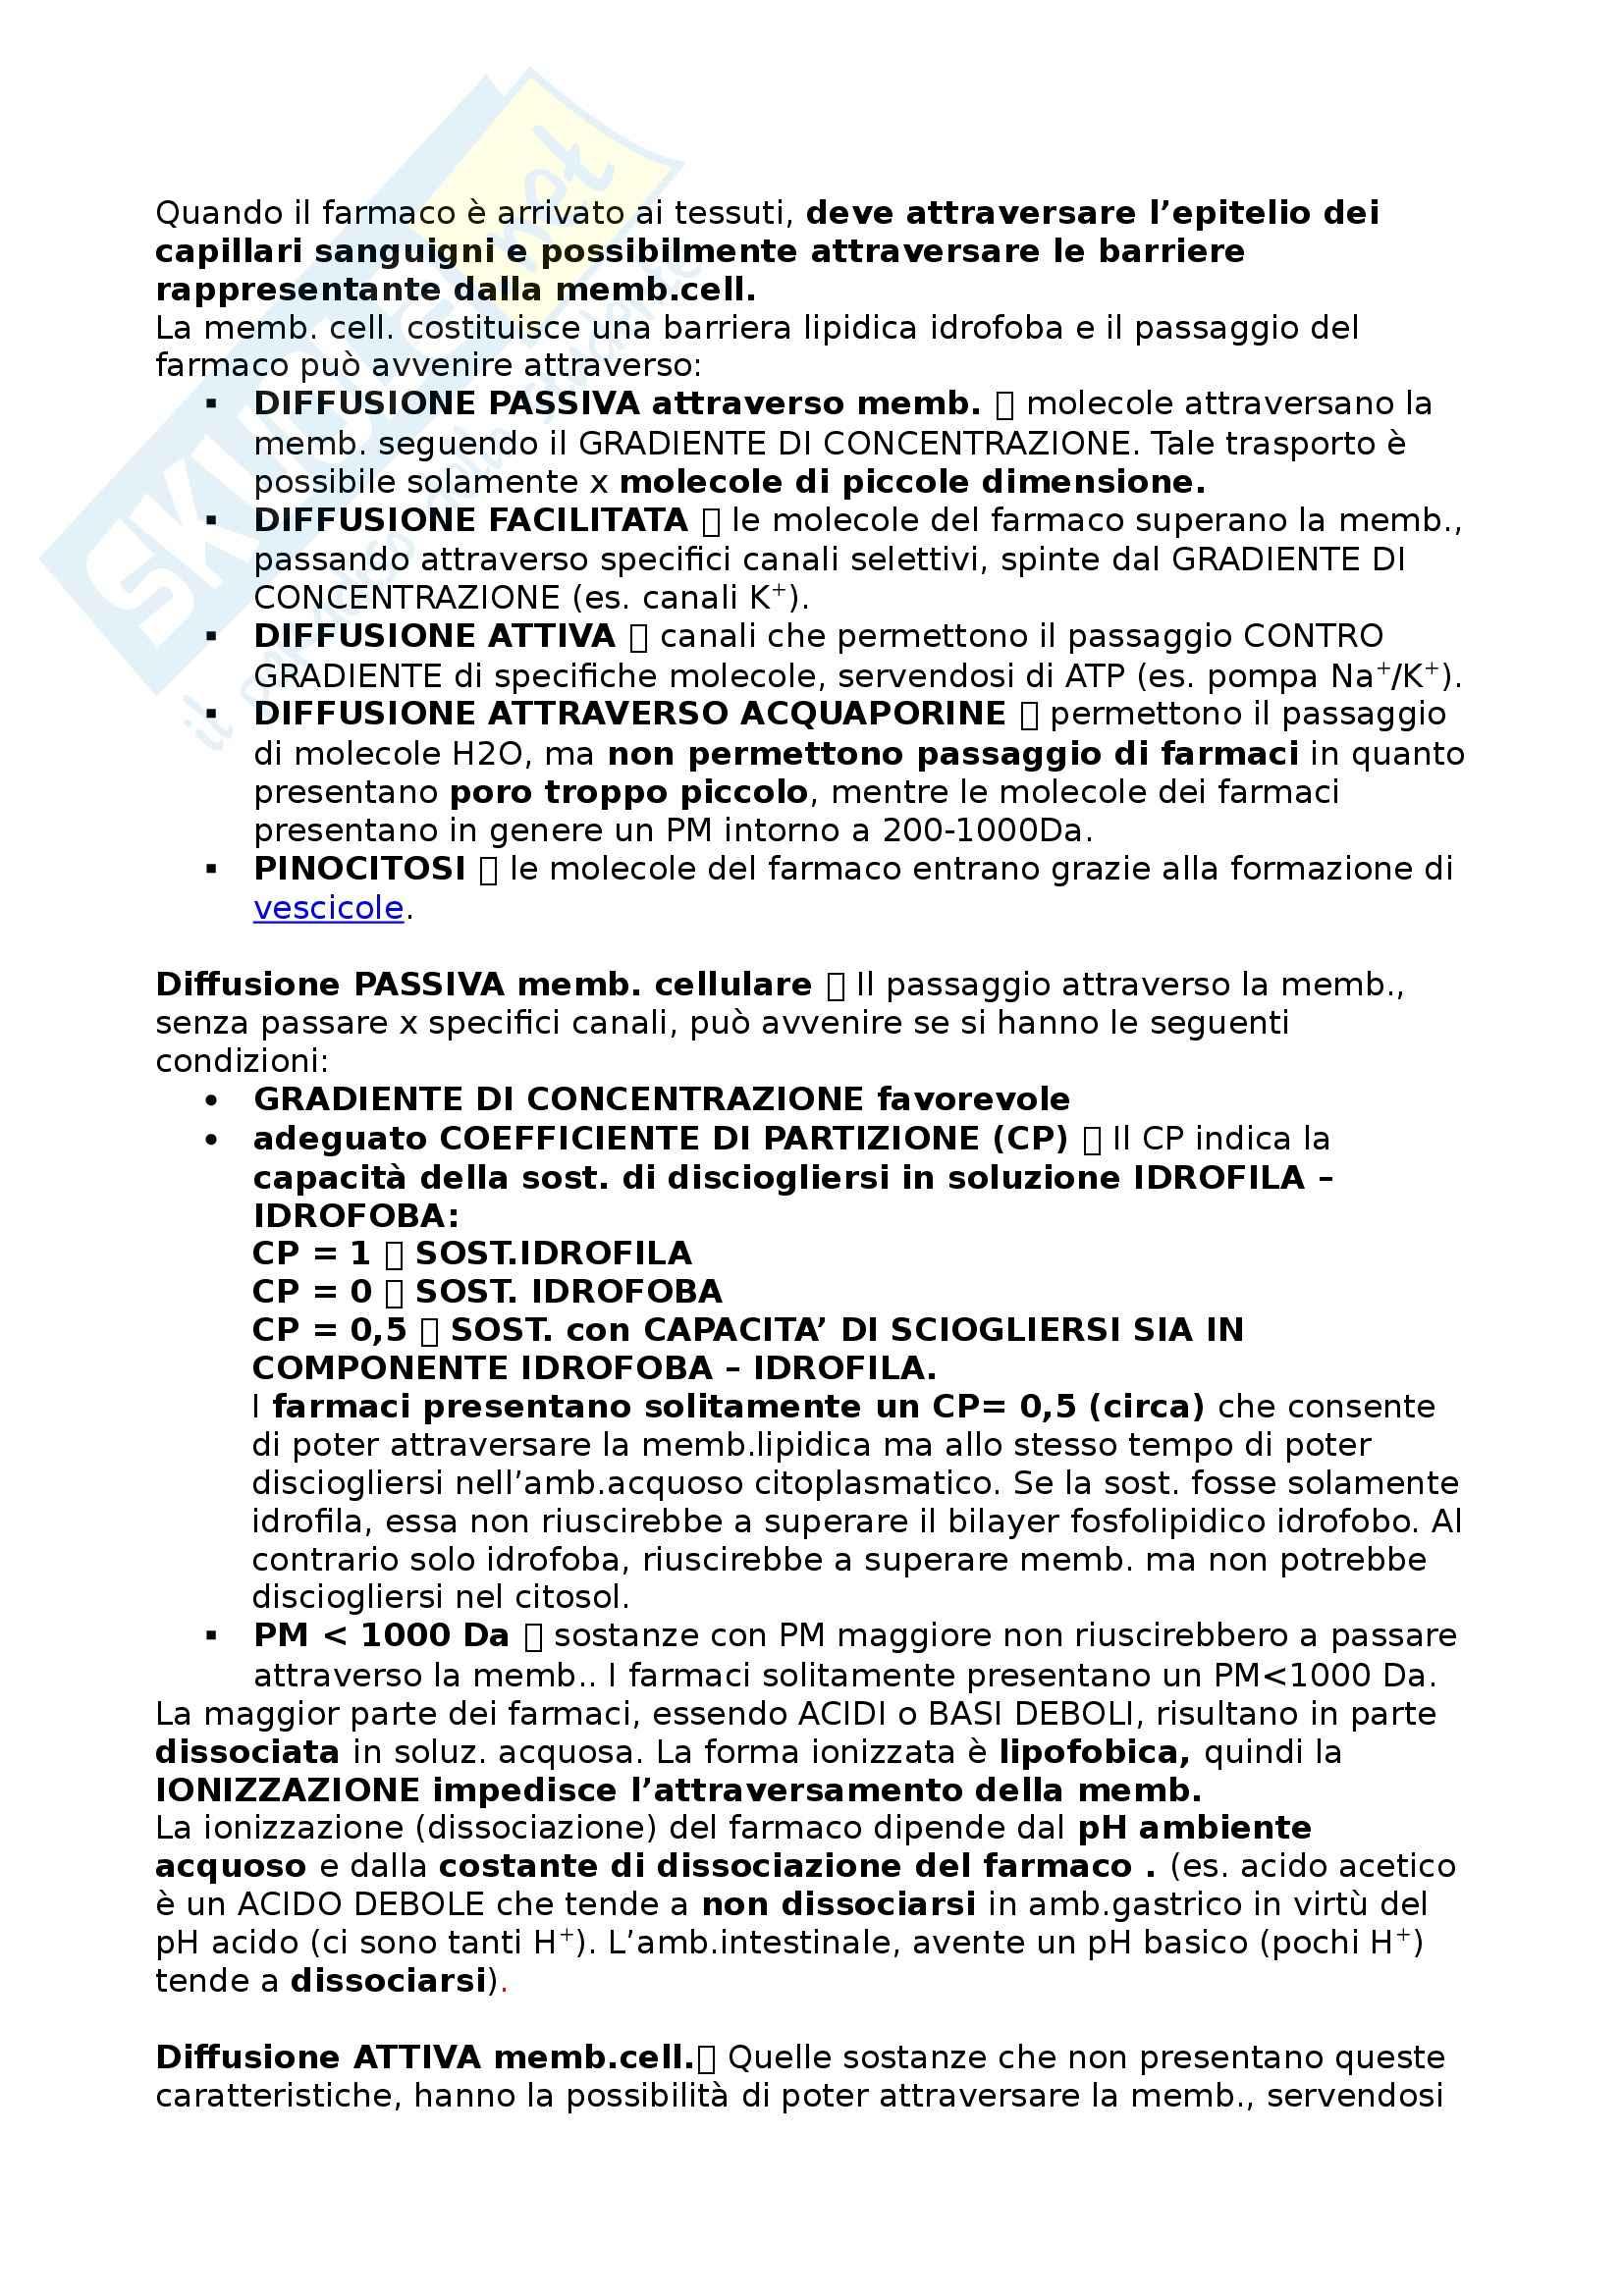 Farmacologia - Appunti Pag. 11